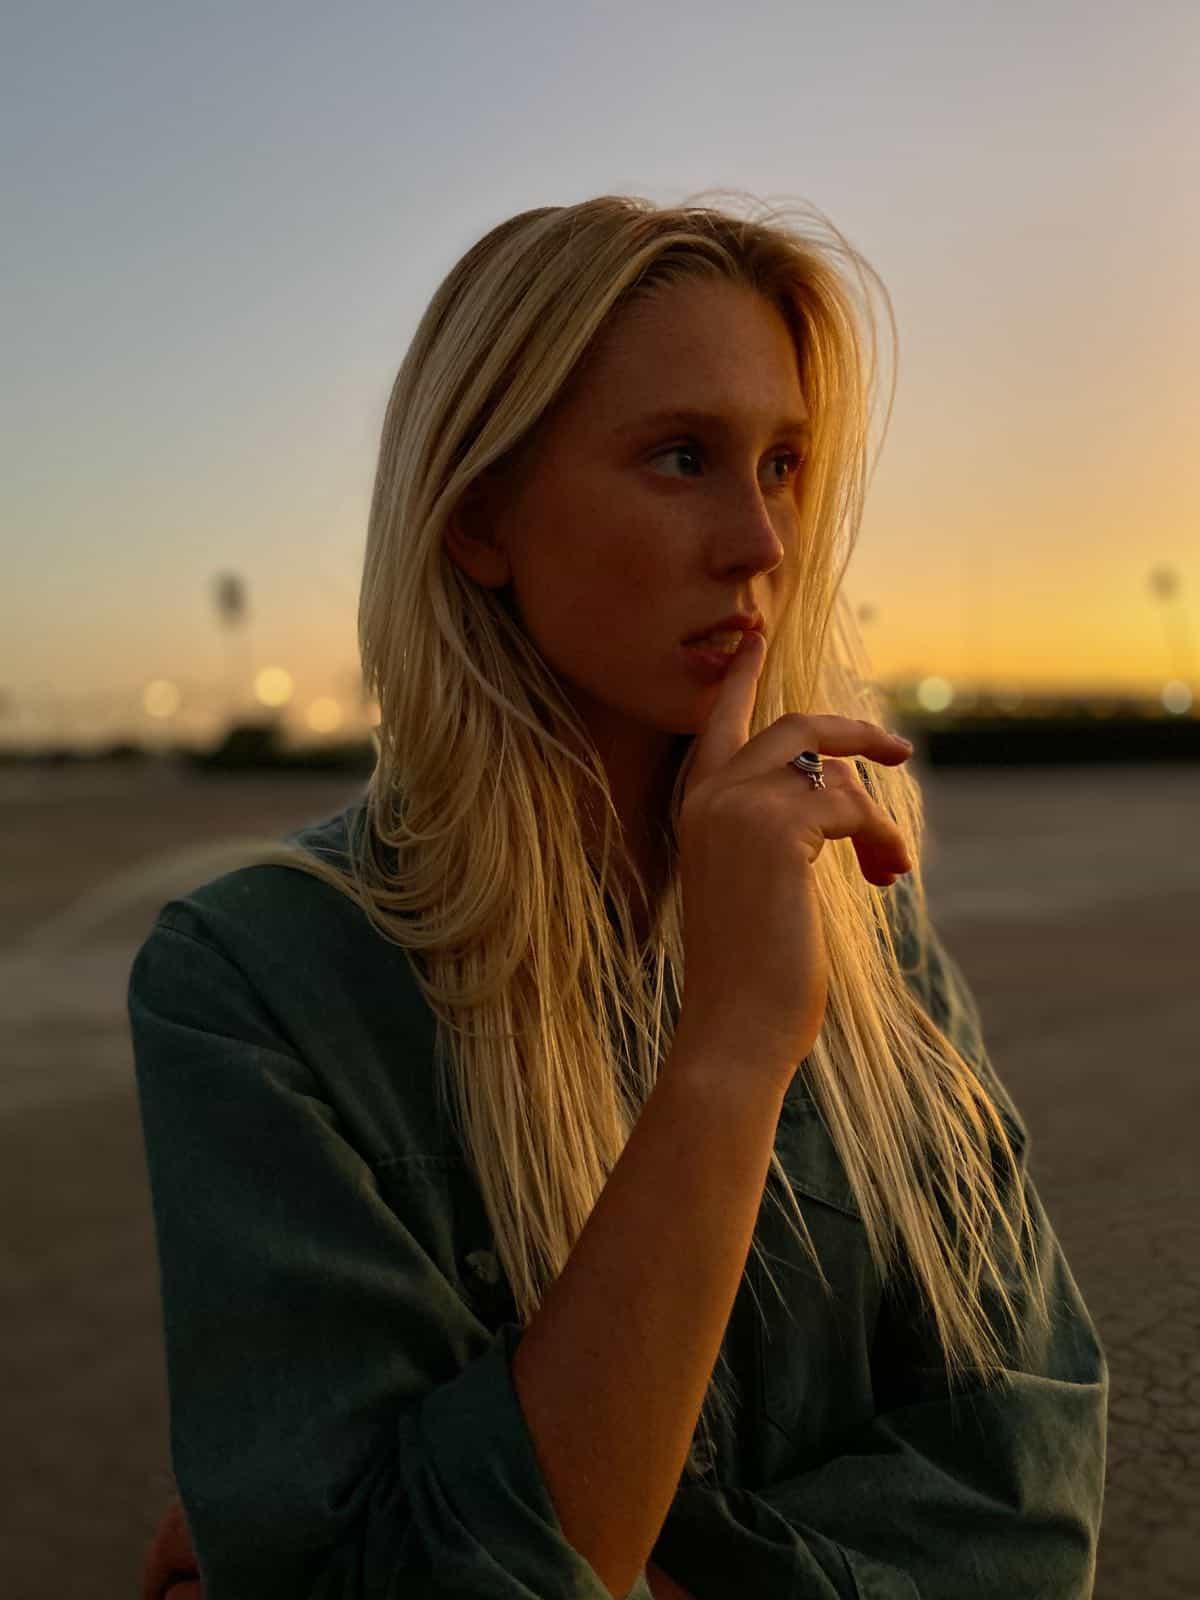 Apple iPhone 11 Pro Portrait Woman Sunset 091019